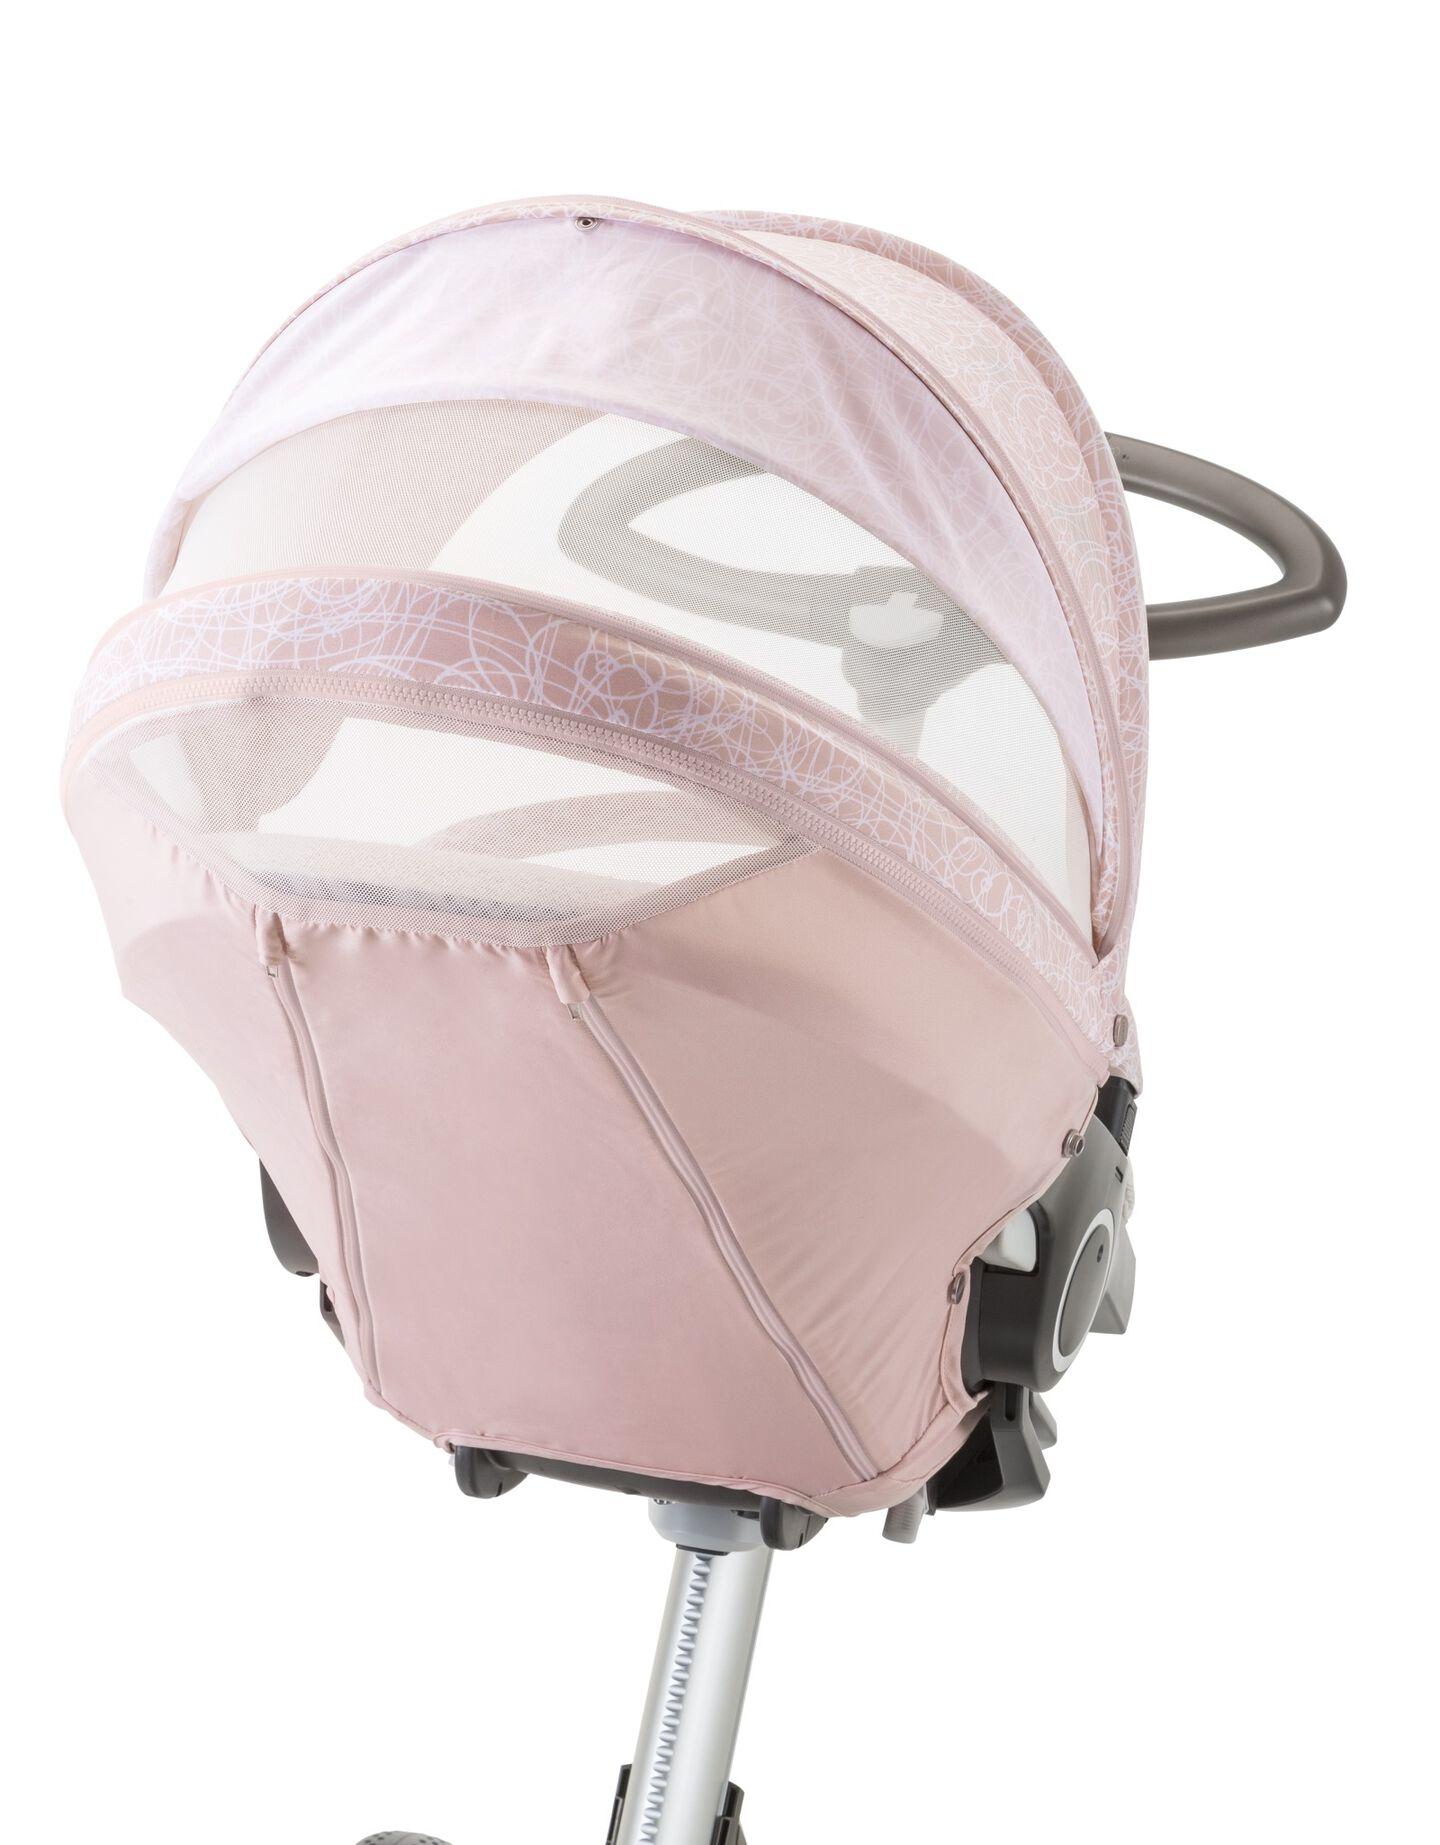 Stokke® Xplory® with Stokke® Stroller Summer Kit Scribble Faded Pink.